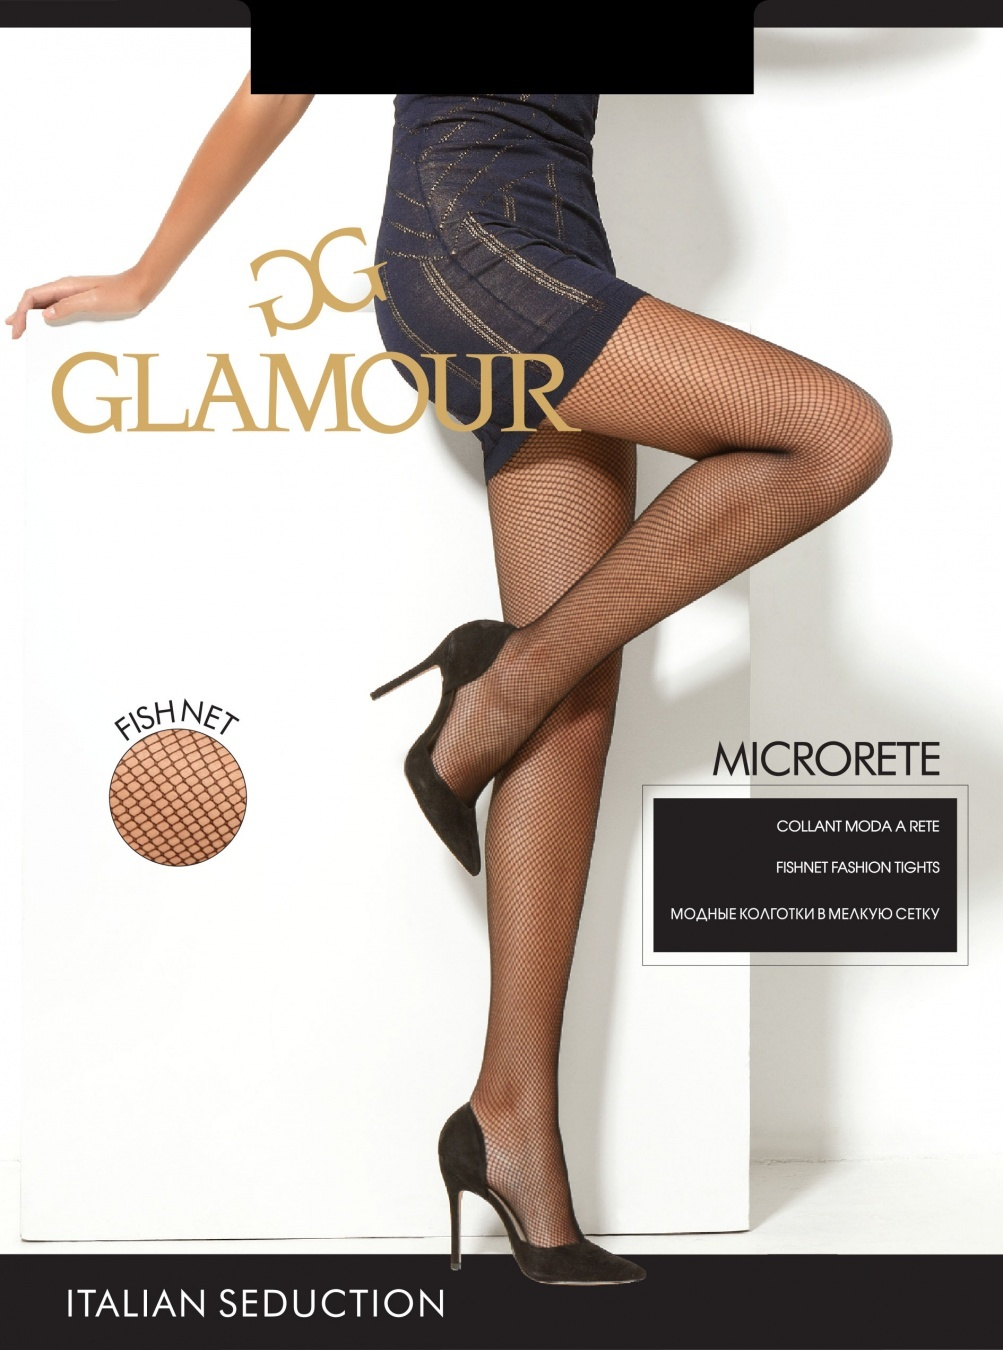 Glamour MICRORETE колготки женские